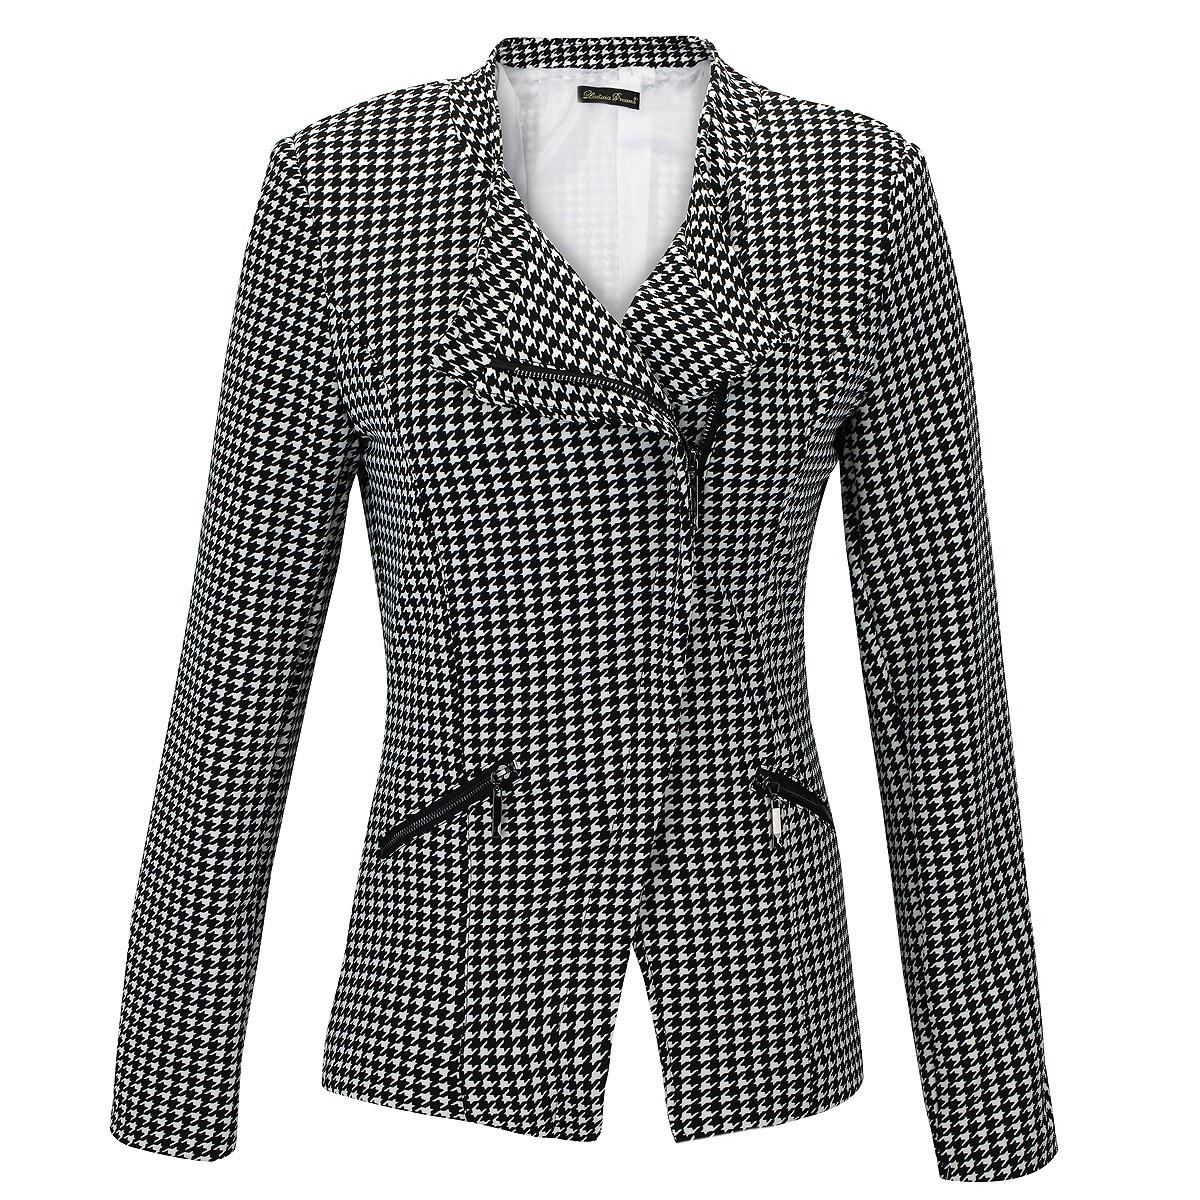 laeticia dreams damen blazer elegant business casual jacke hahnentritt s m l xl ebay. Black Bedroom Furniture Sets. Home Design Ideas